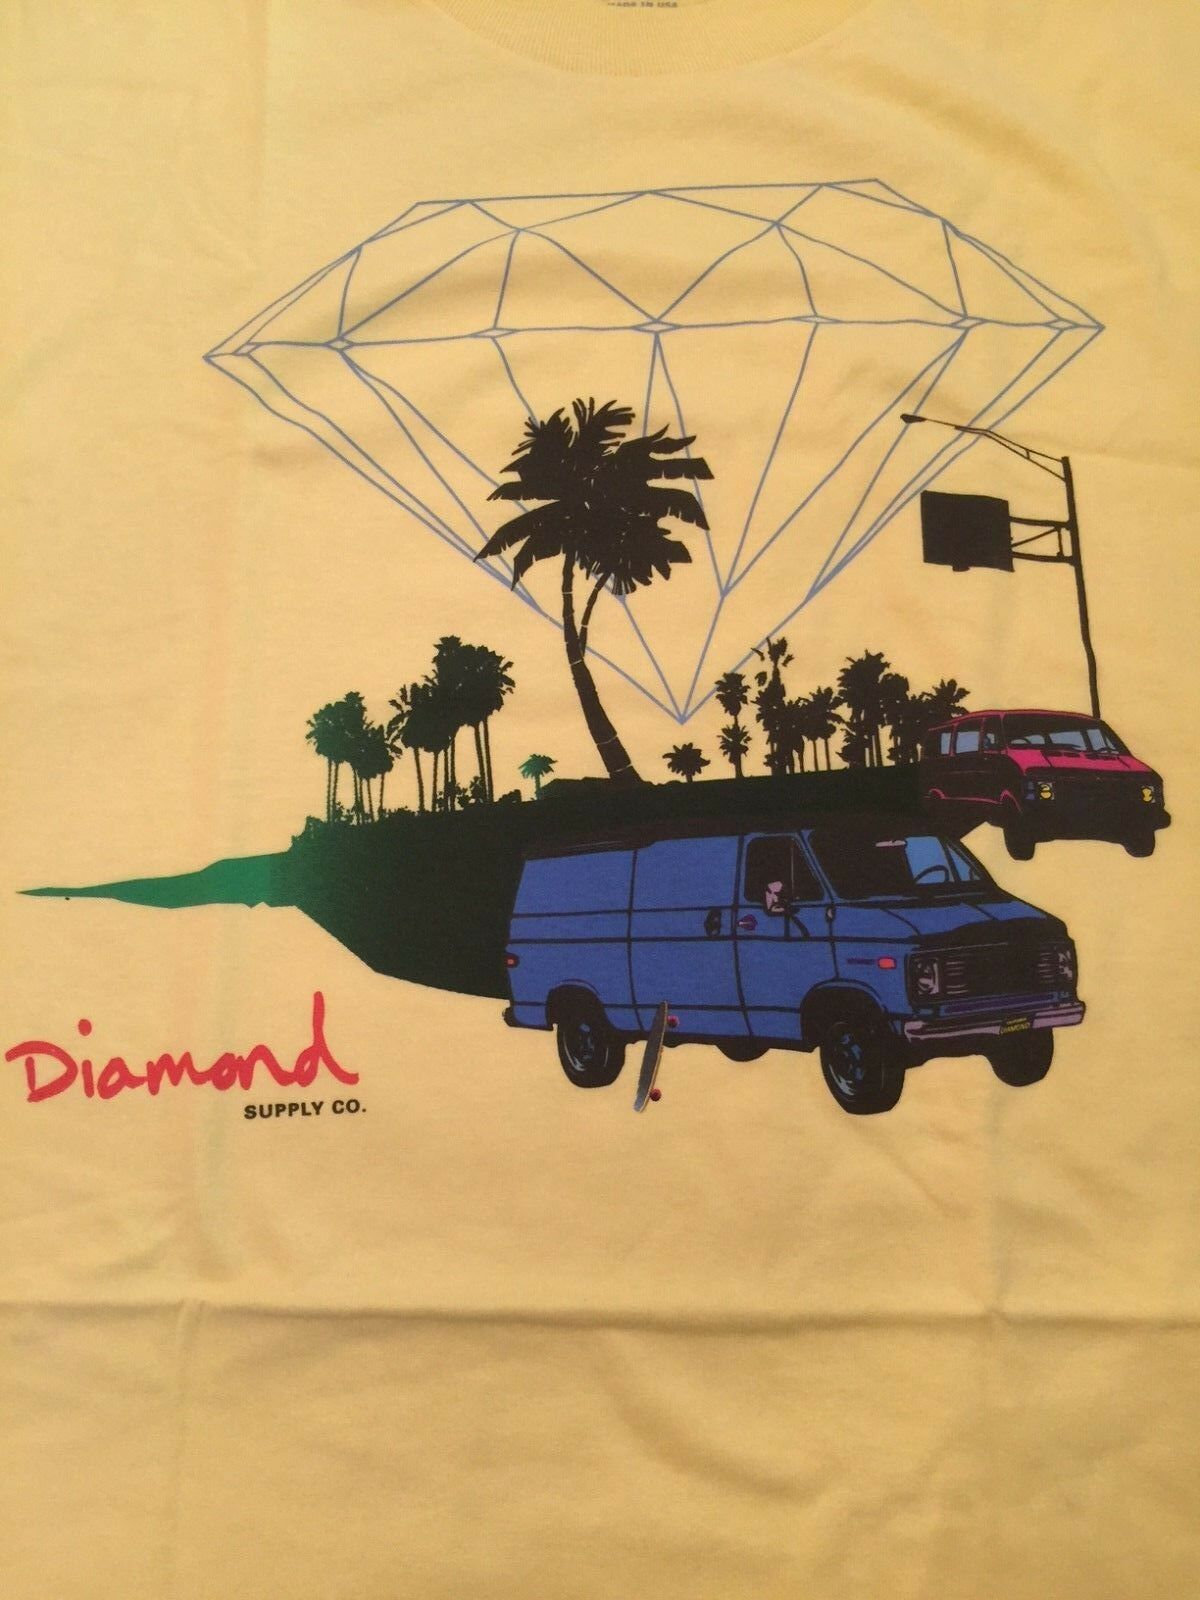 Diamond Supply Co. Cruisin Tee s s Pina Colada (Yellow) Large - Circa 2008 RARE